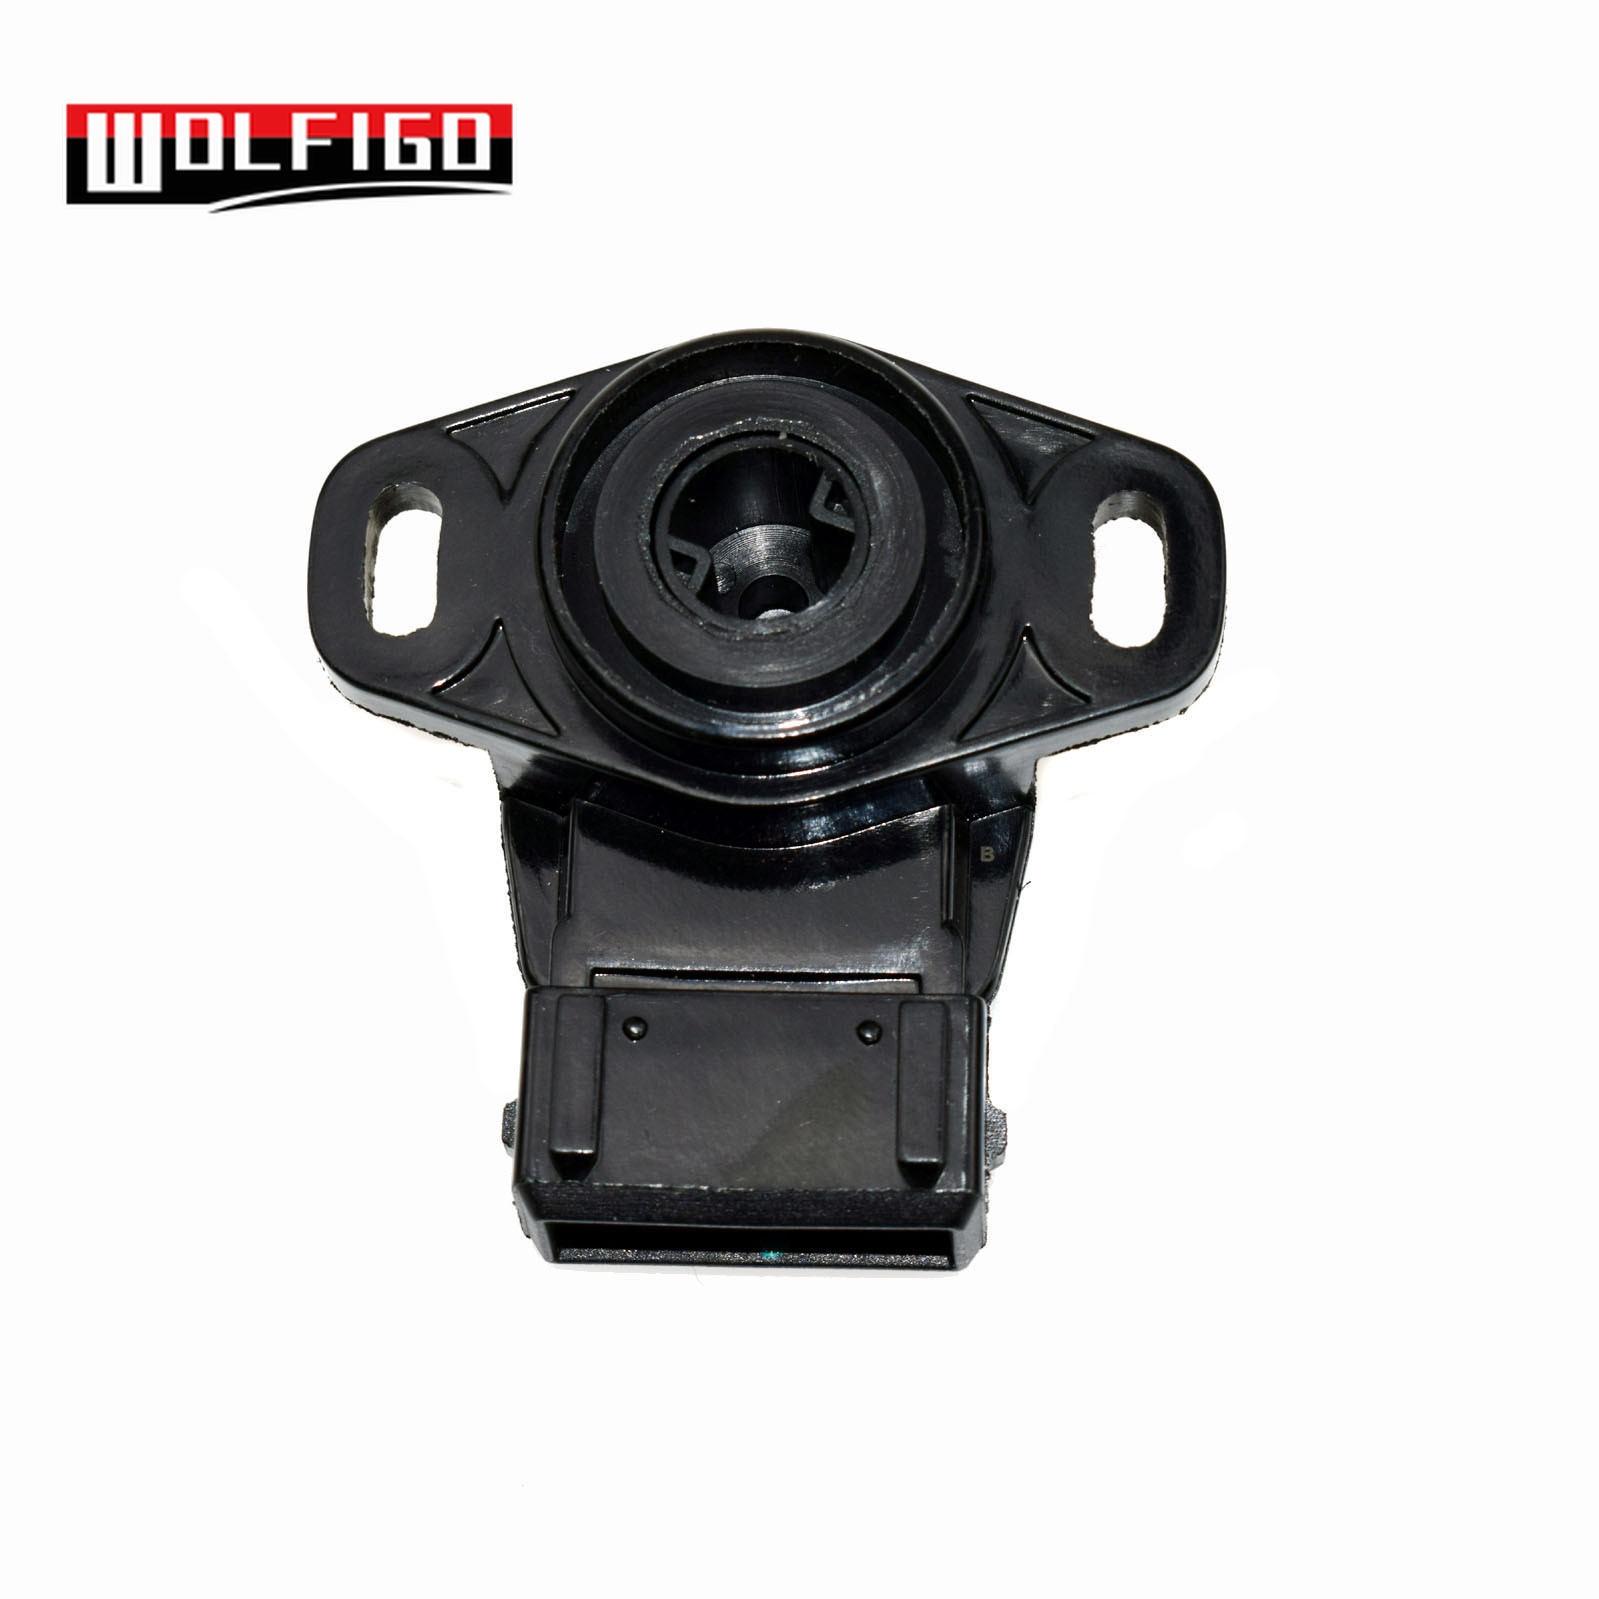 Throttle Position Sensor for Sebring Stratus Eclipse Galant Montero MD628077 New